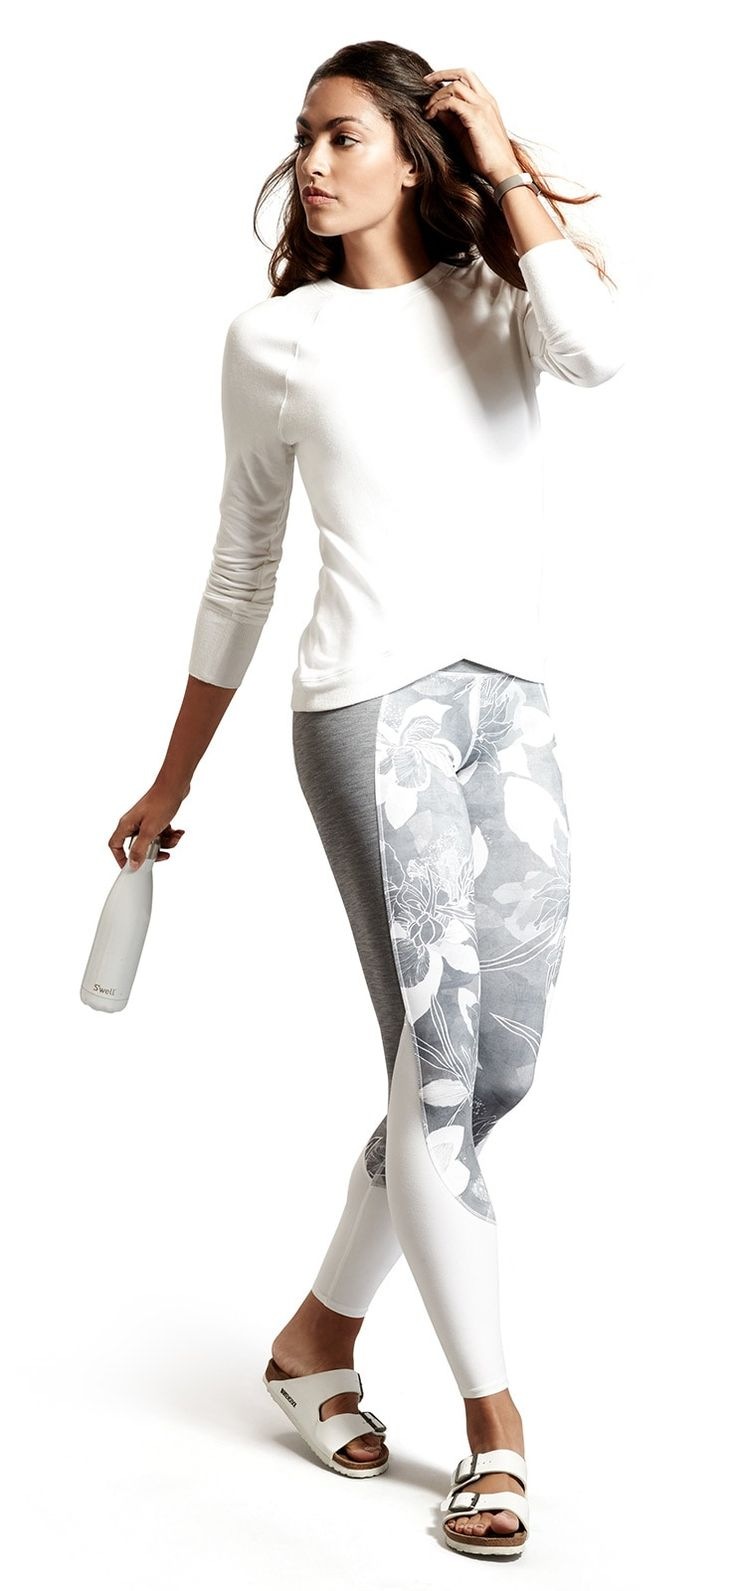 New 2017 Yoga Looks:  High Rise Tropical Flow Chaturanga™ Tight // Criss Cross Sweatshirt